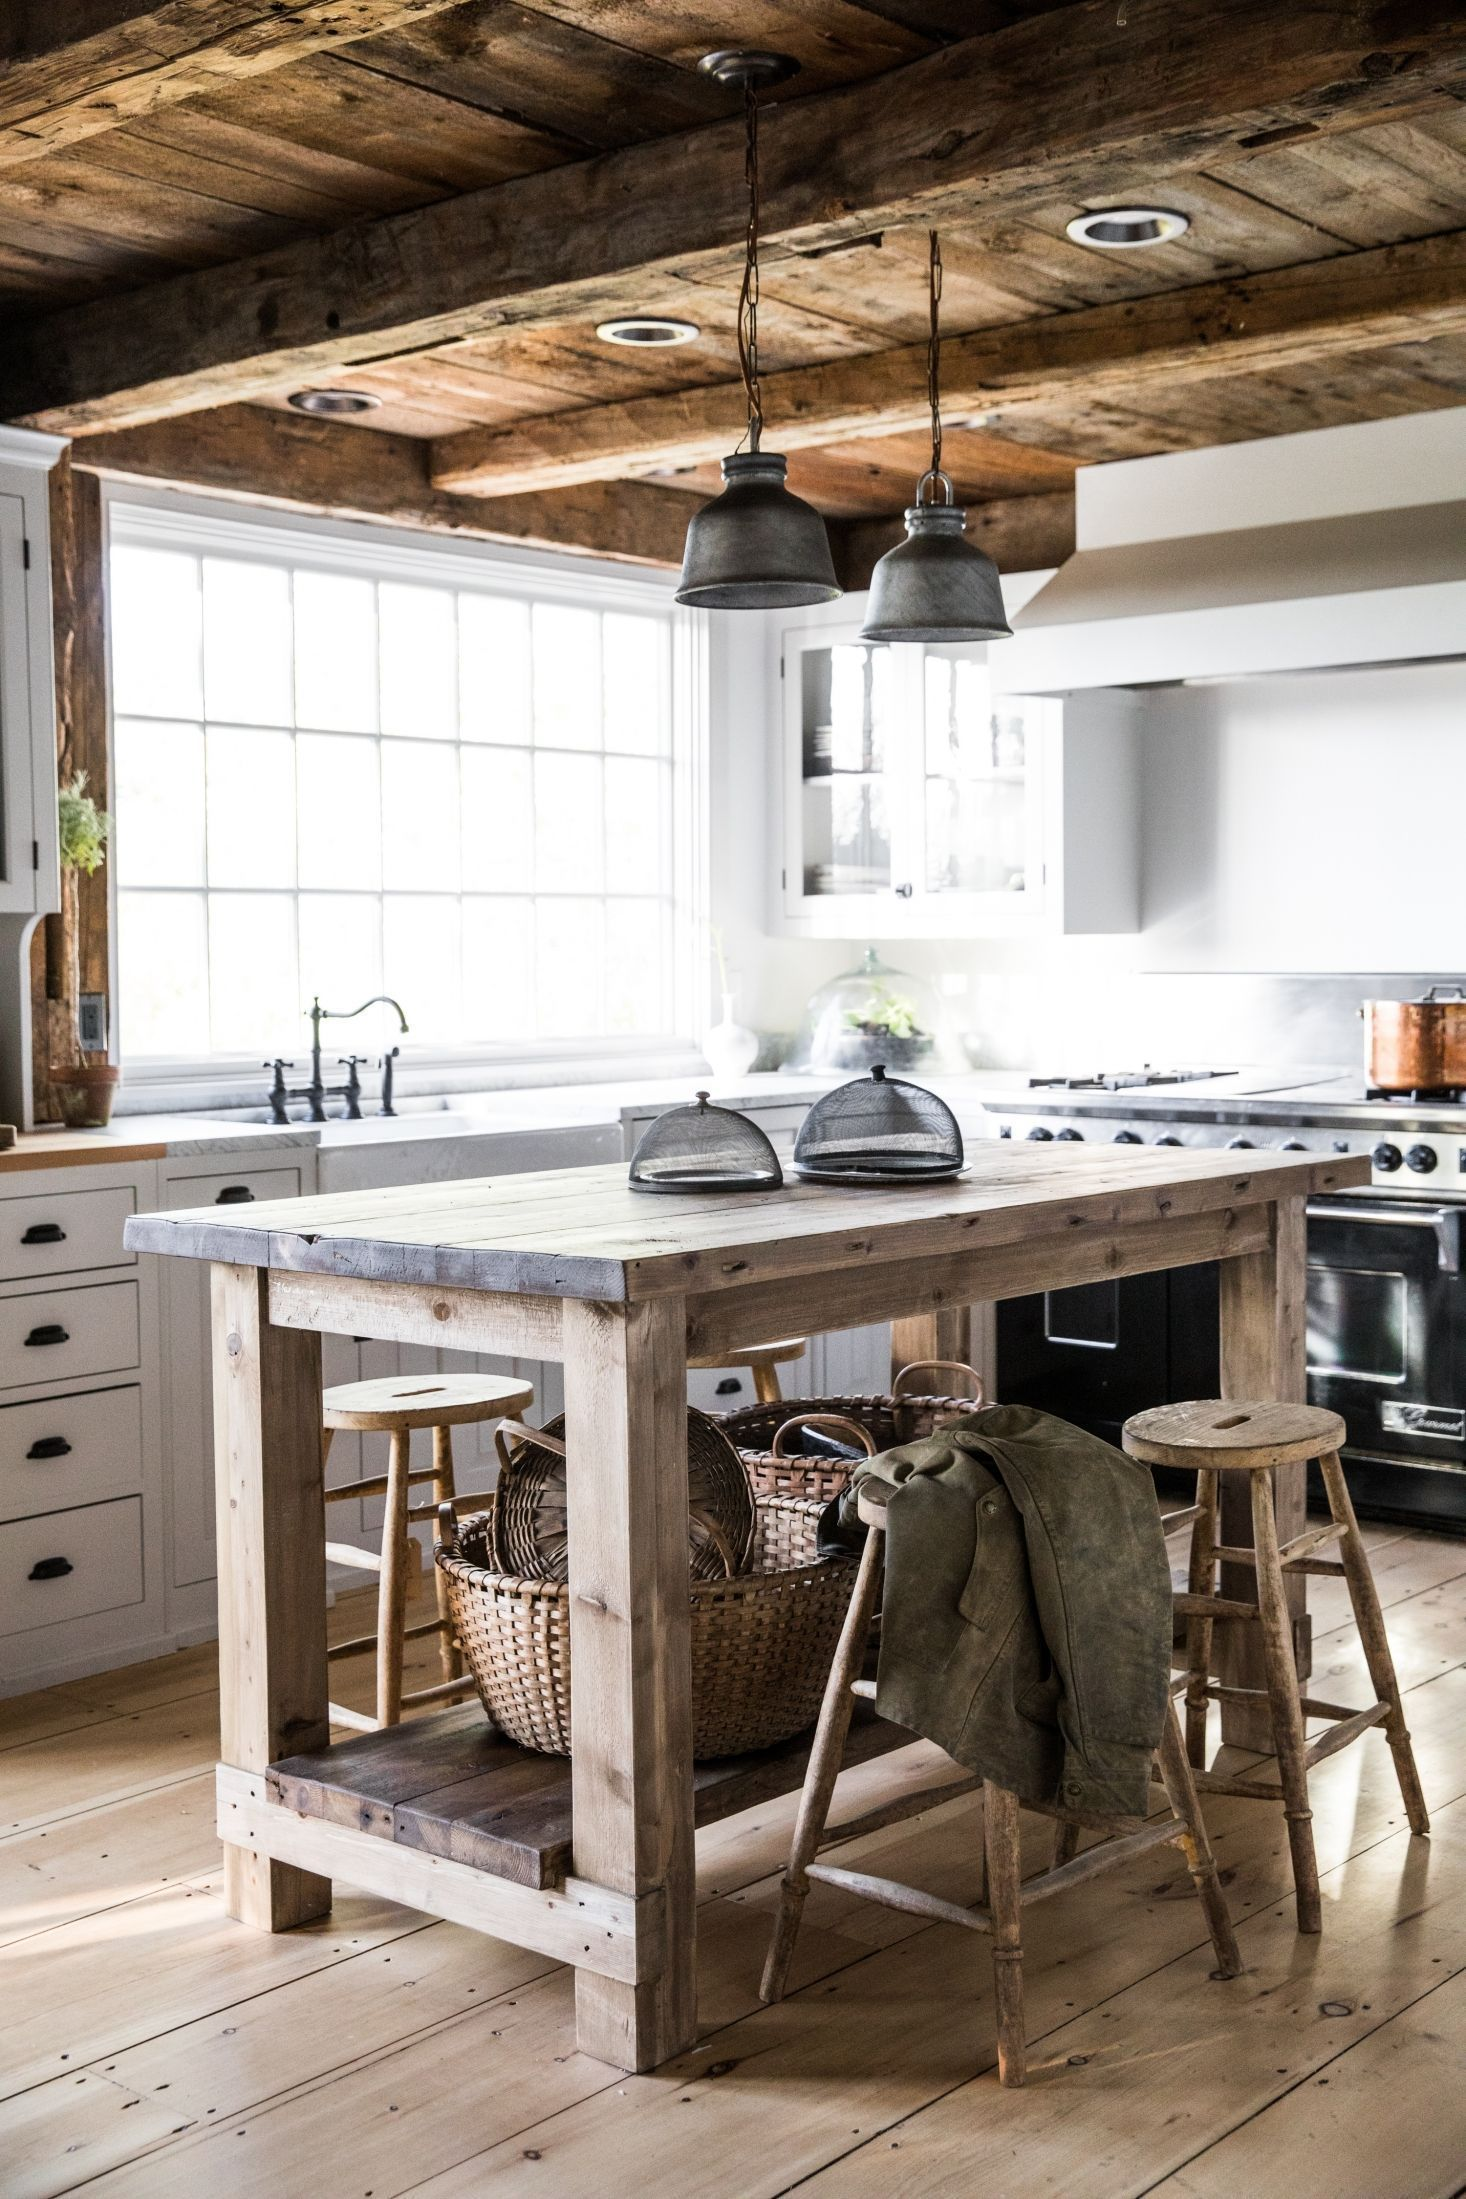 Full Size of Küchen Rustikal Recycled Kitchen Countertop Ideas Countertopsideas Küche Esstisch Holz Rustikaler Rustikales Bett Regal Wohnzimmer Küchen Rustikal